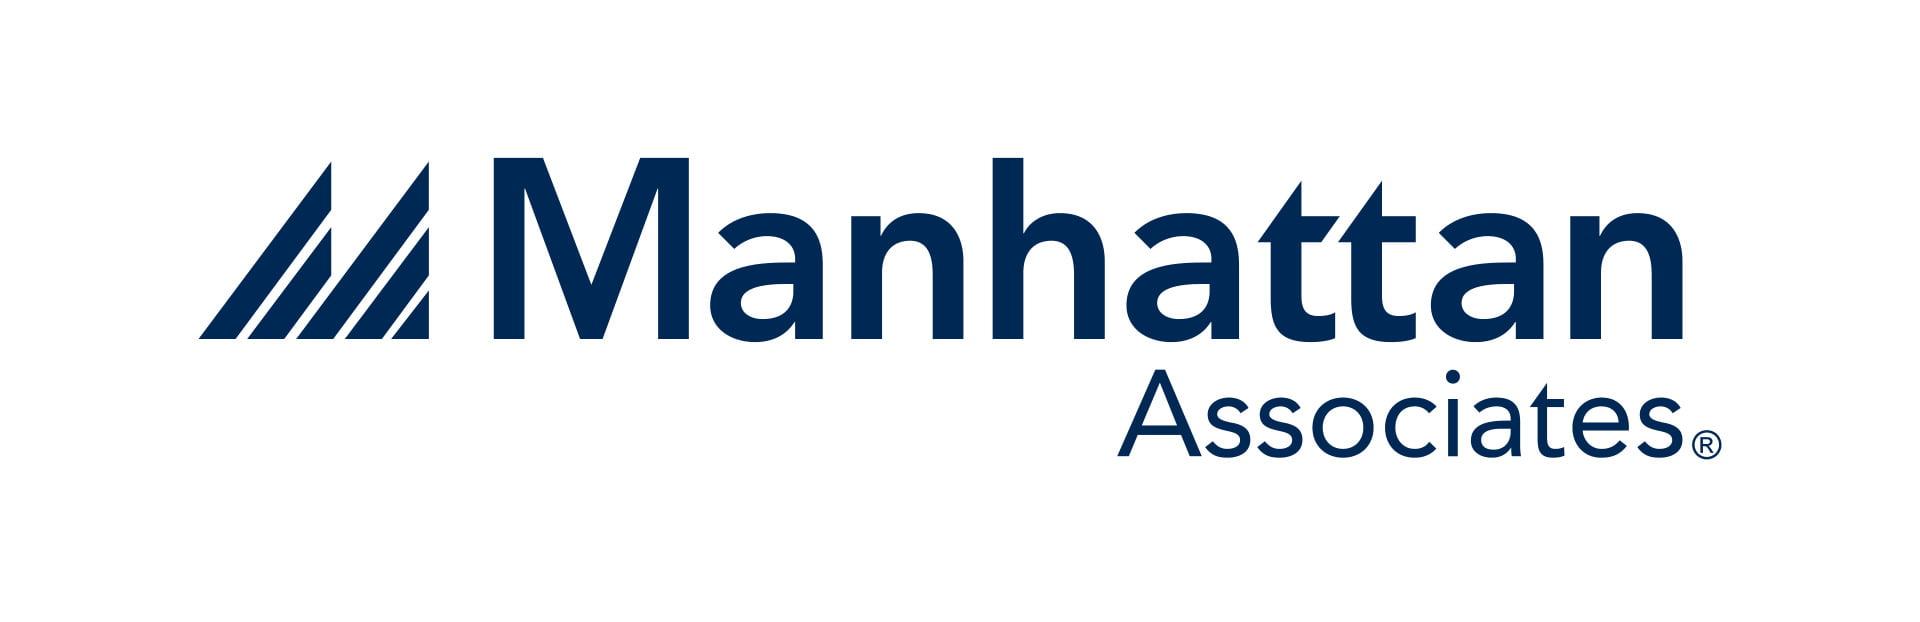 Hive Partner Manhattan